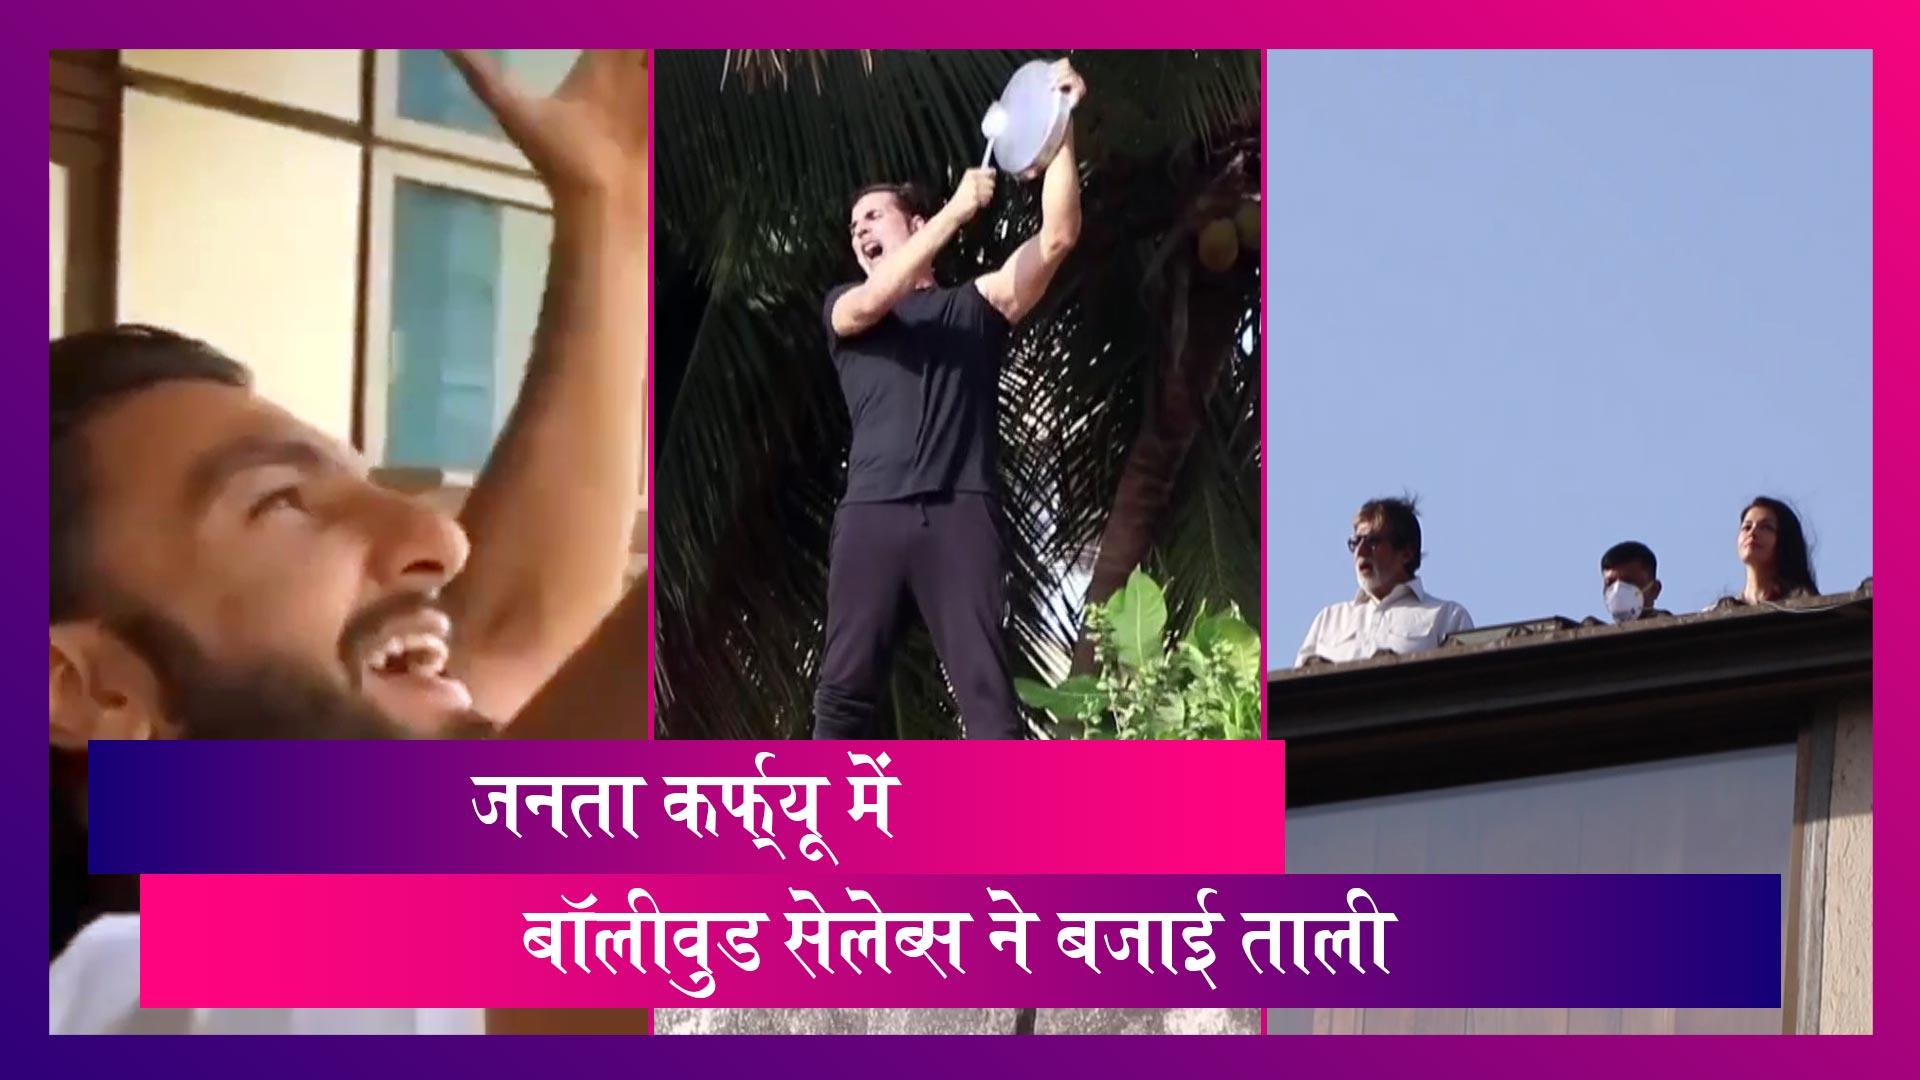 Janata Curfew के दिन Amitabh, Kartik, Hrithik, Deepika, Ranveer ने बजाई ताली | Celebs Spotted